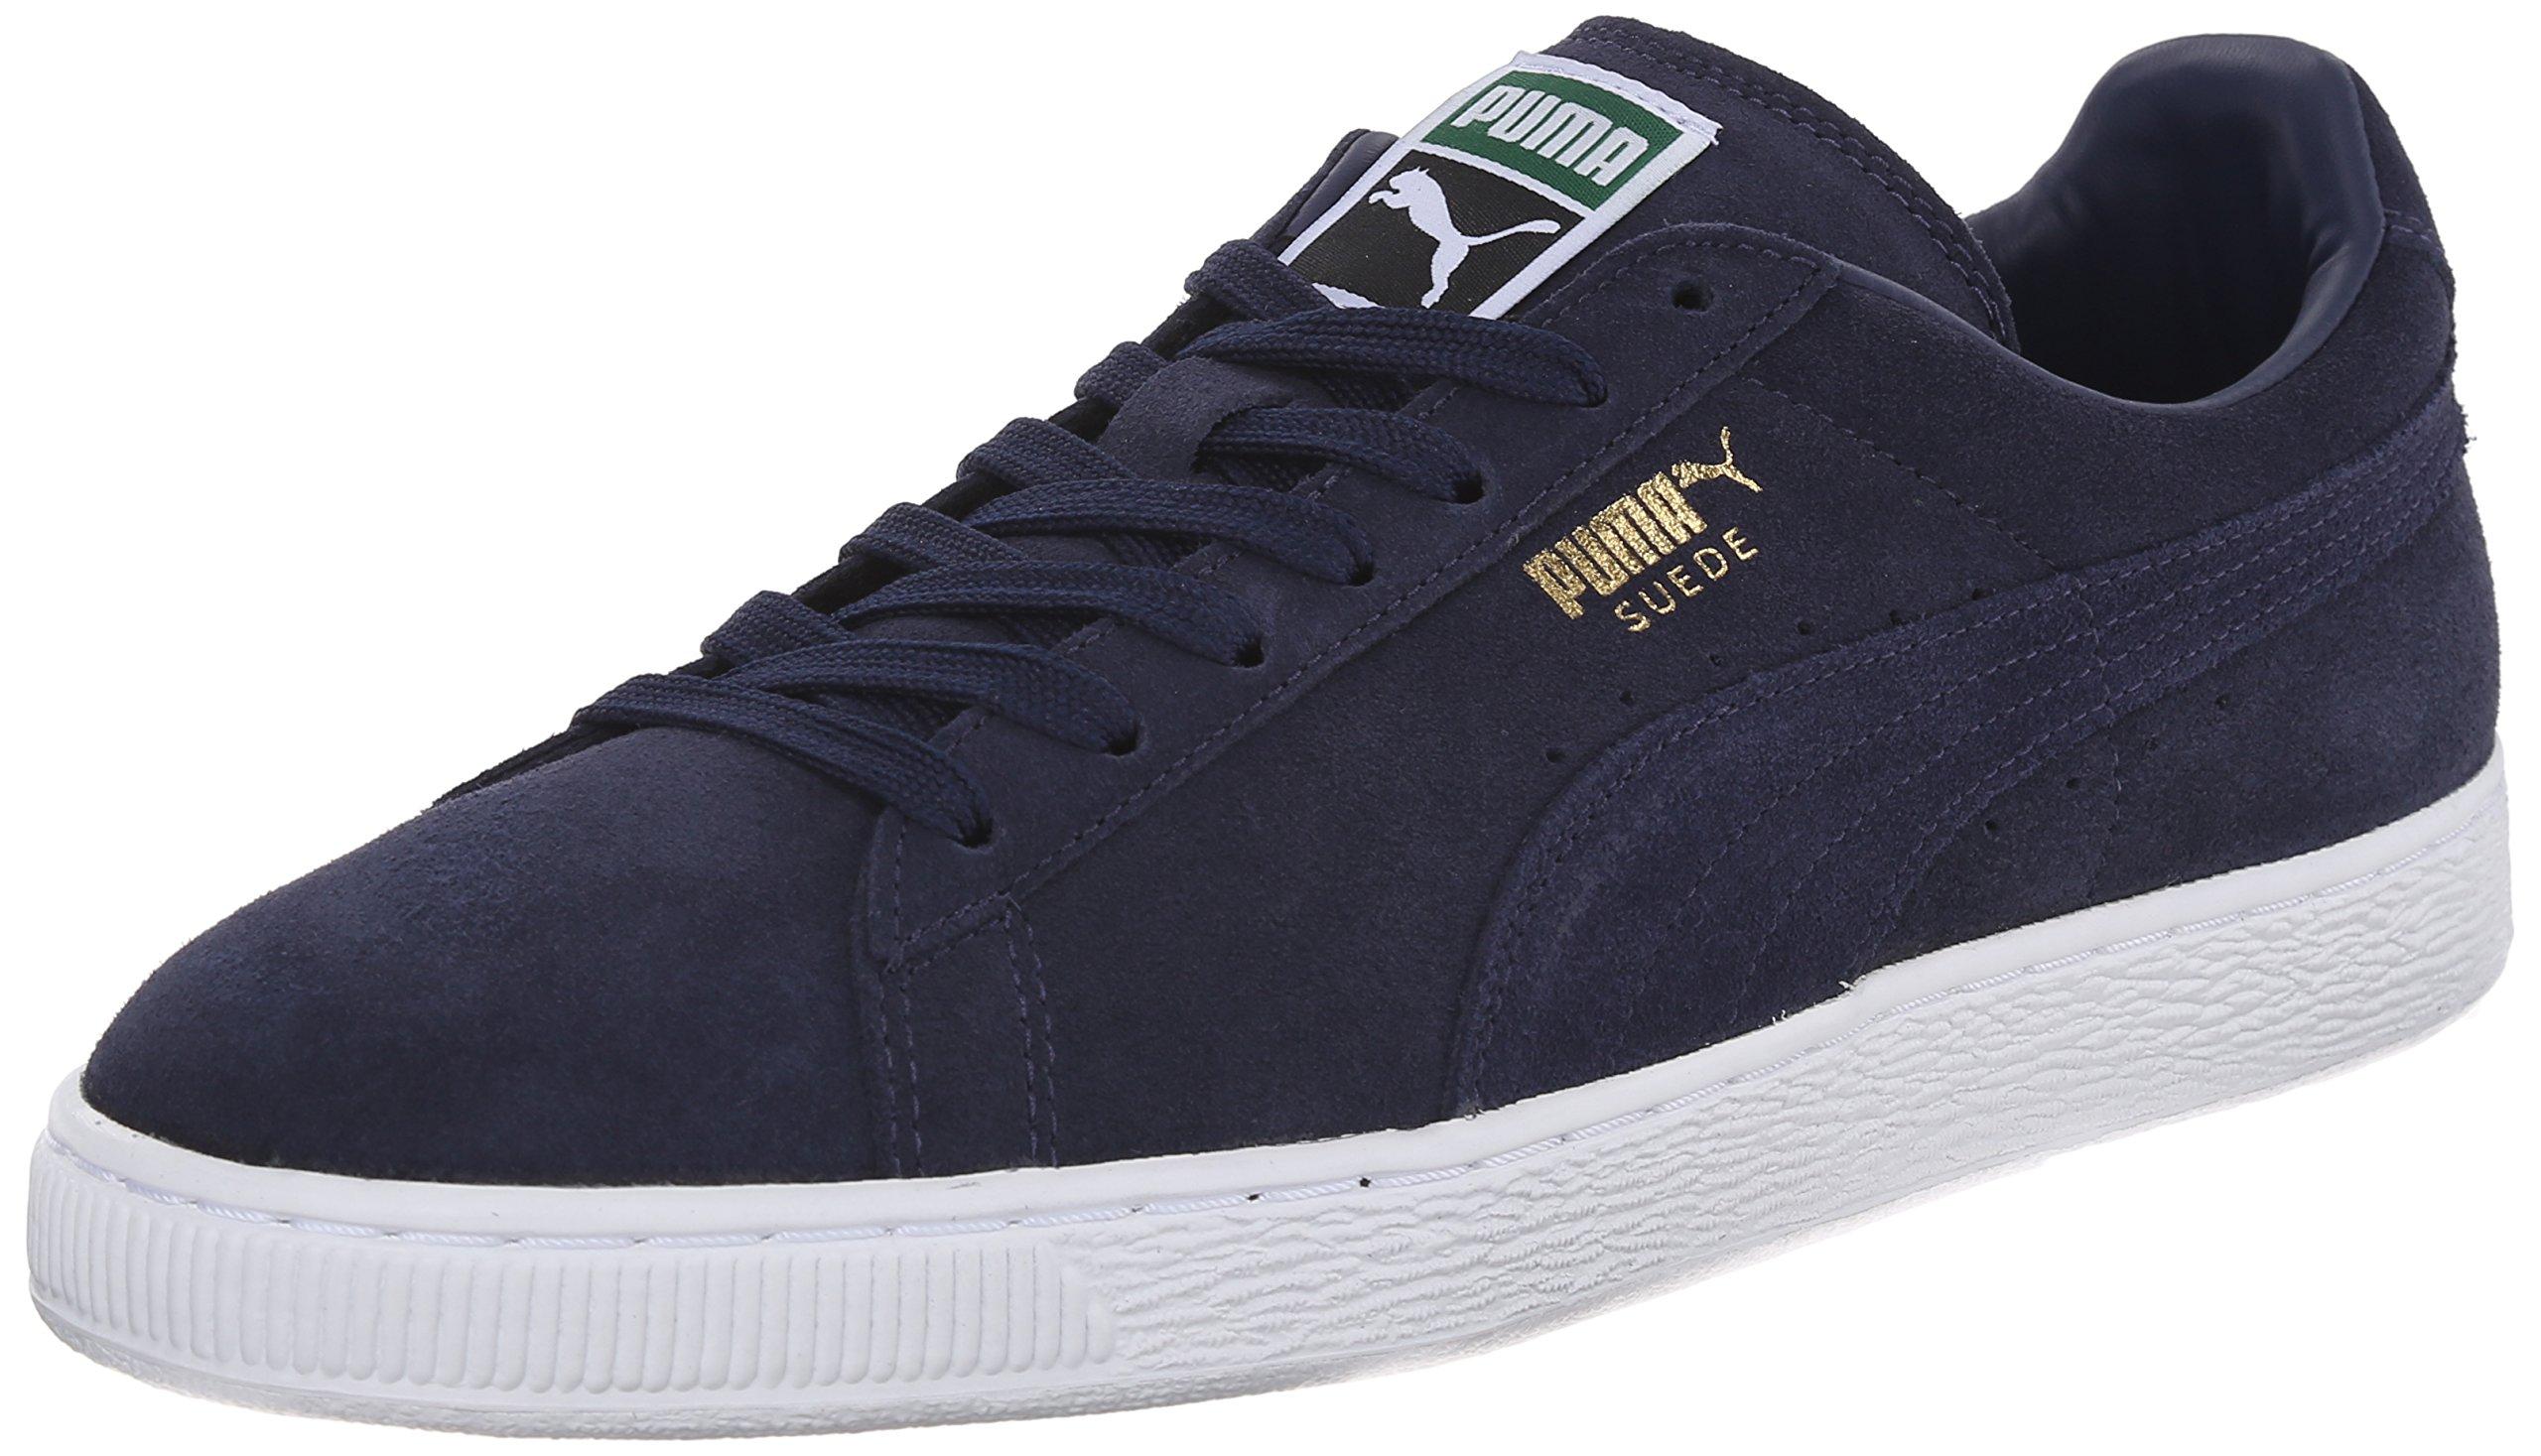 PUMA Men's Suede Classic + Lace-Up Fashion Sneaker, Peacoat/Peacoat/White, 13 M US